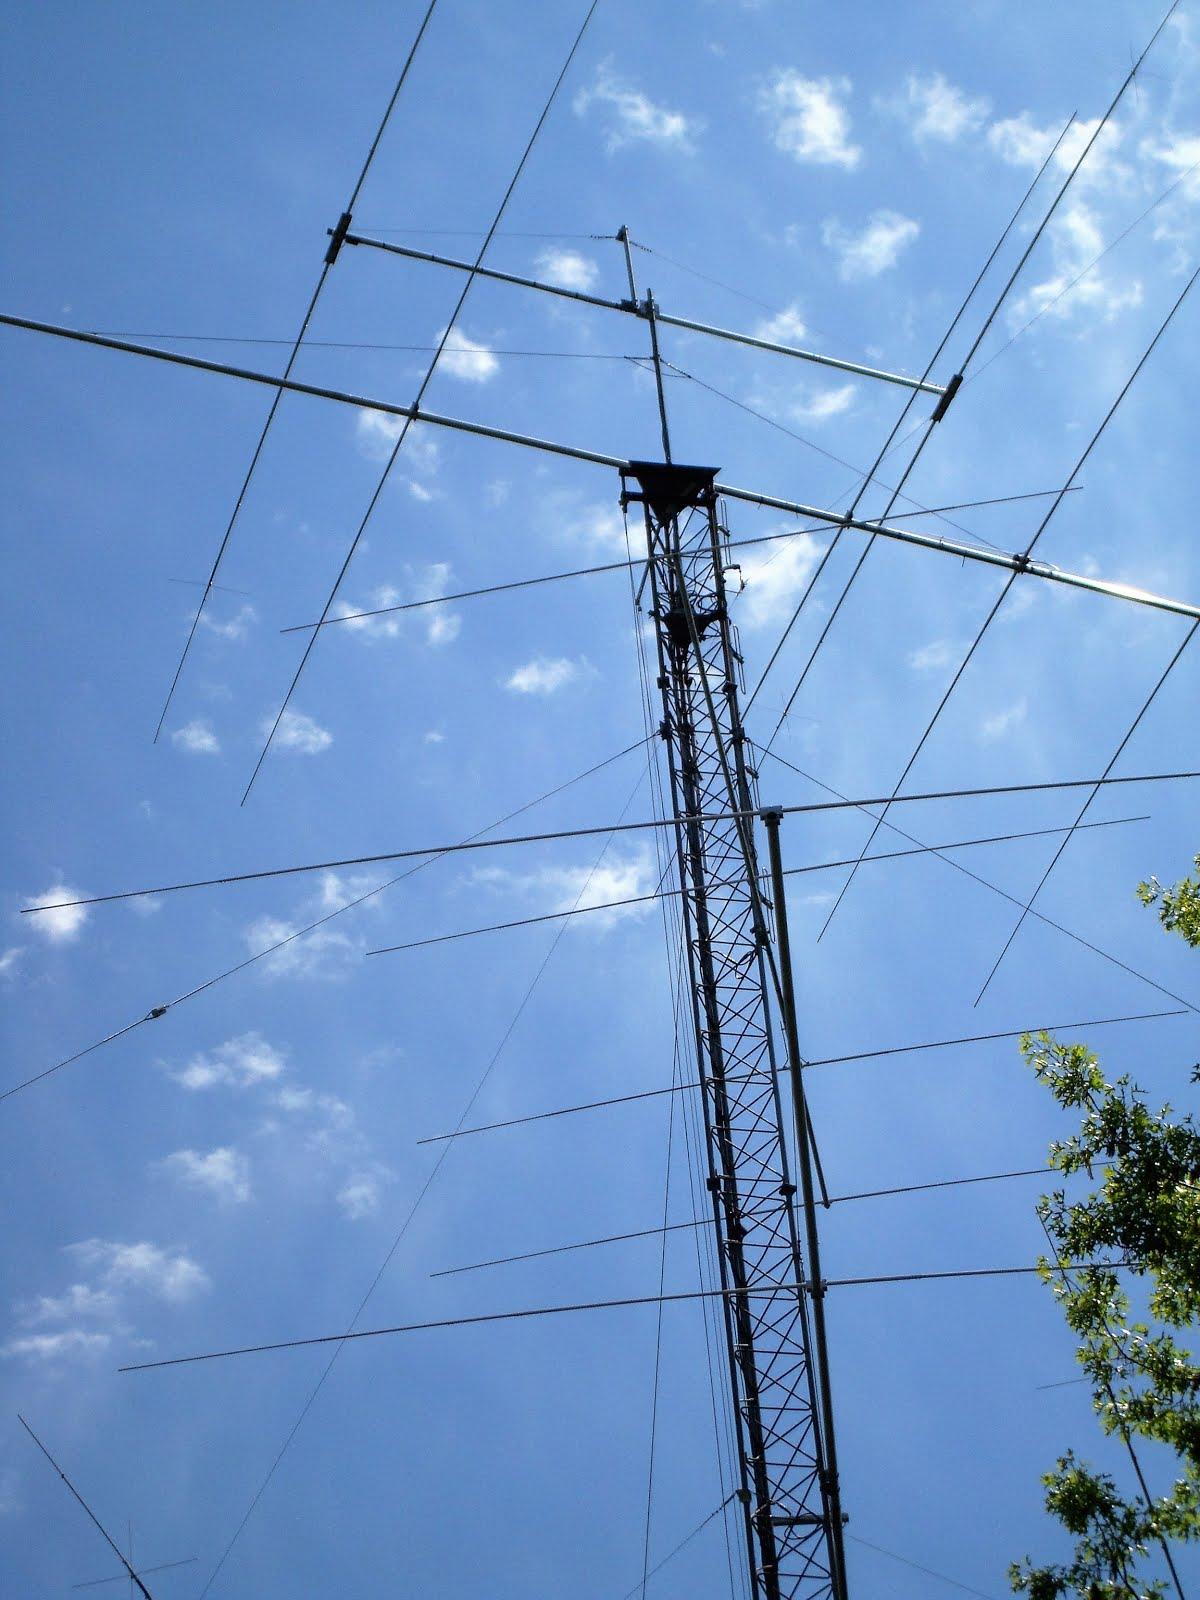 One of three ham towers at W1AW, Newington.